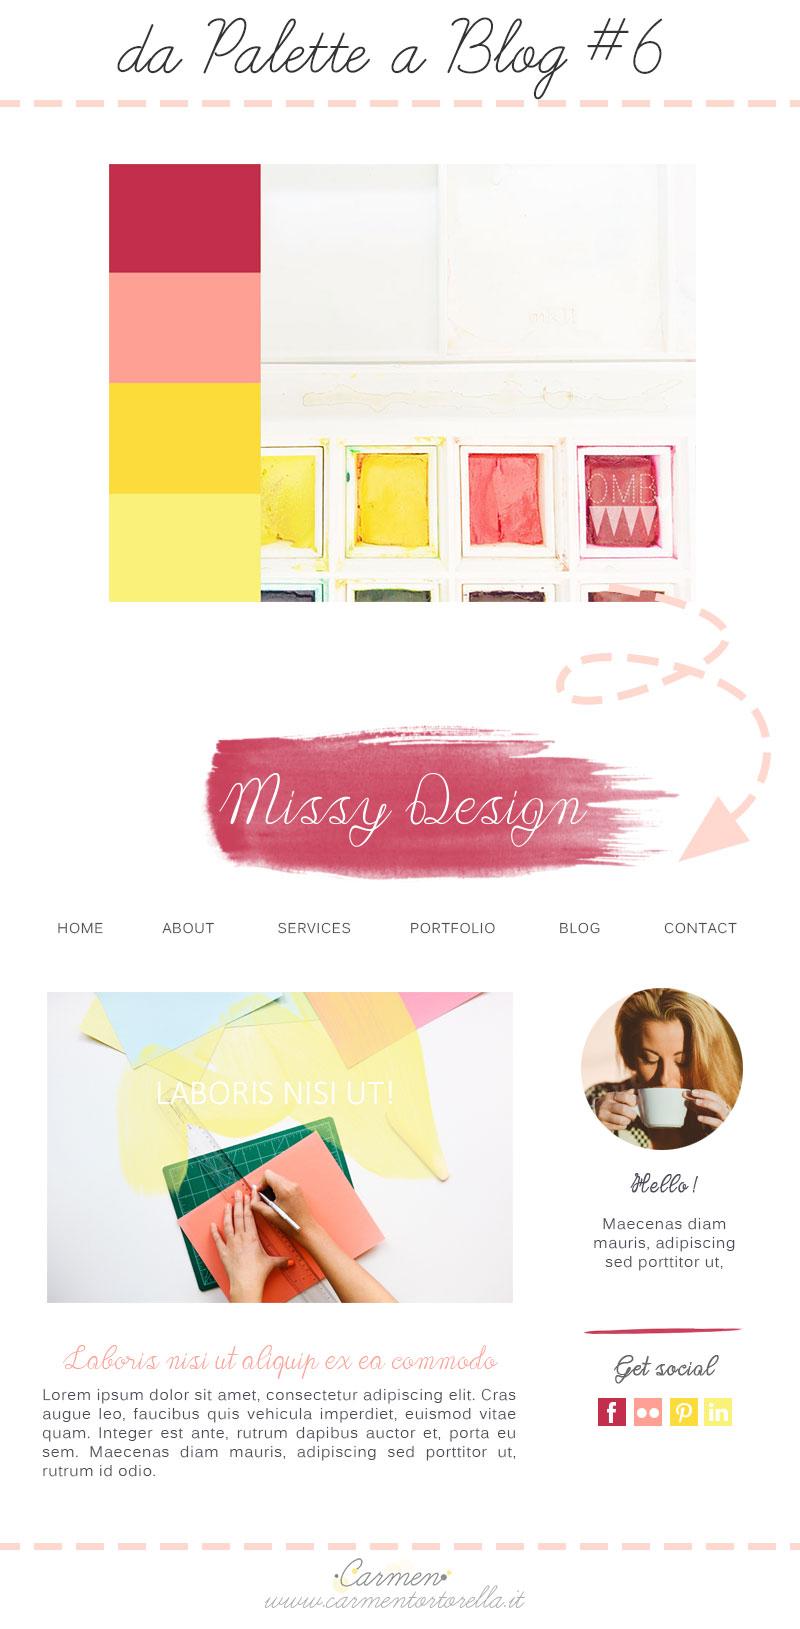 Da Palette a Blog design #5